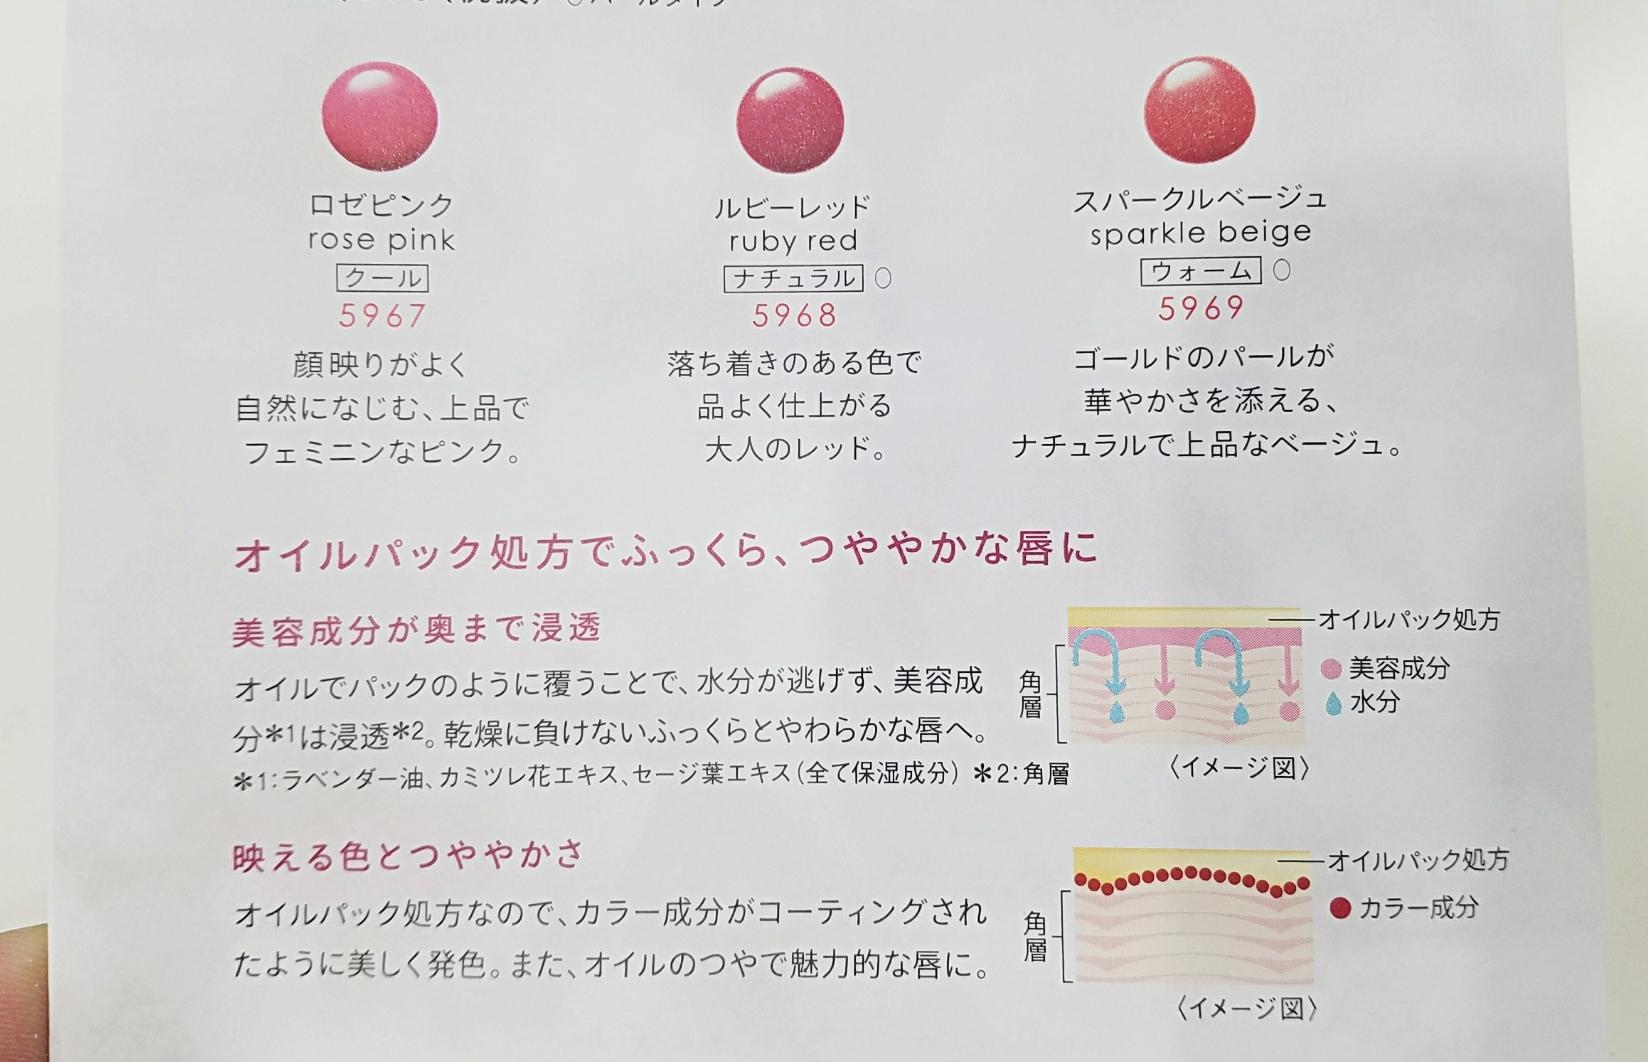 Cenbless 成増フェイシャル&ネイルサロン ノエビア アクトリース オイルリップ